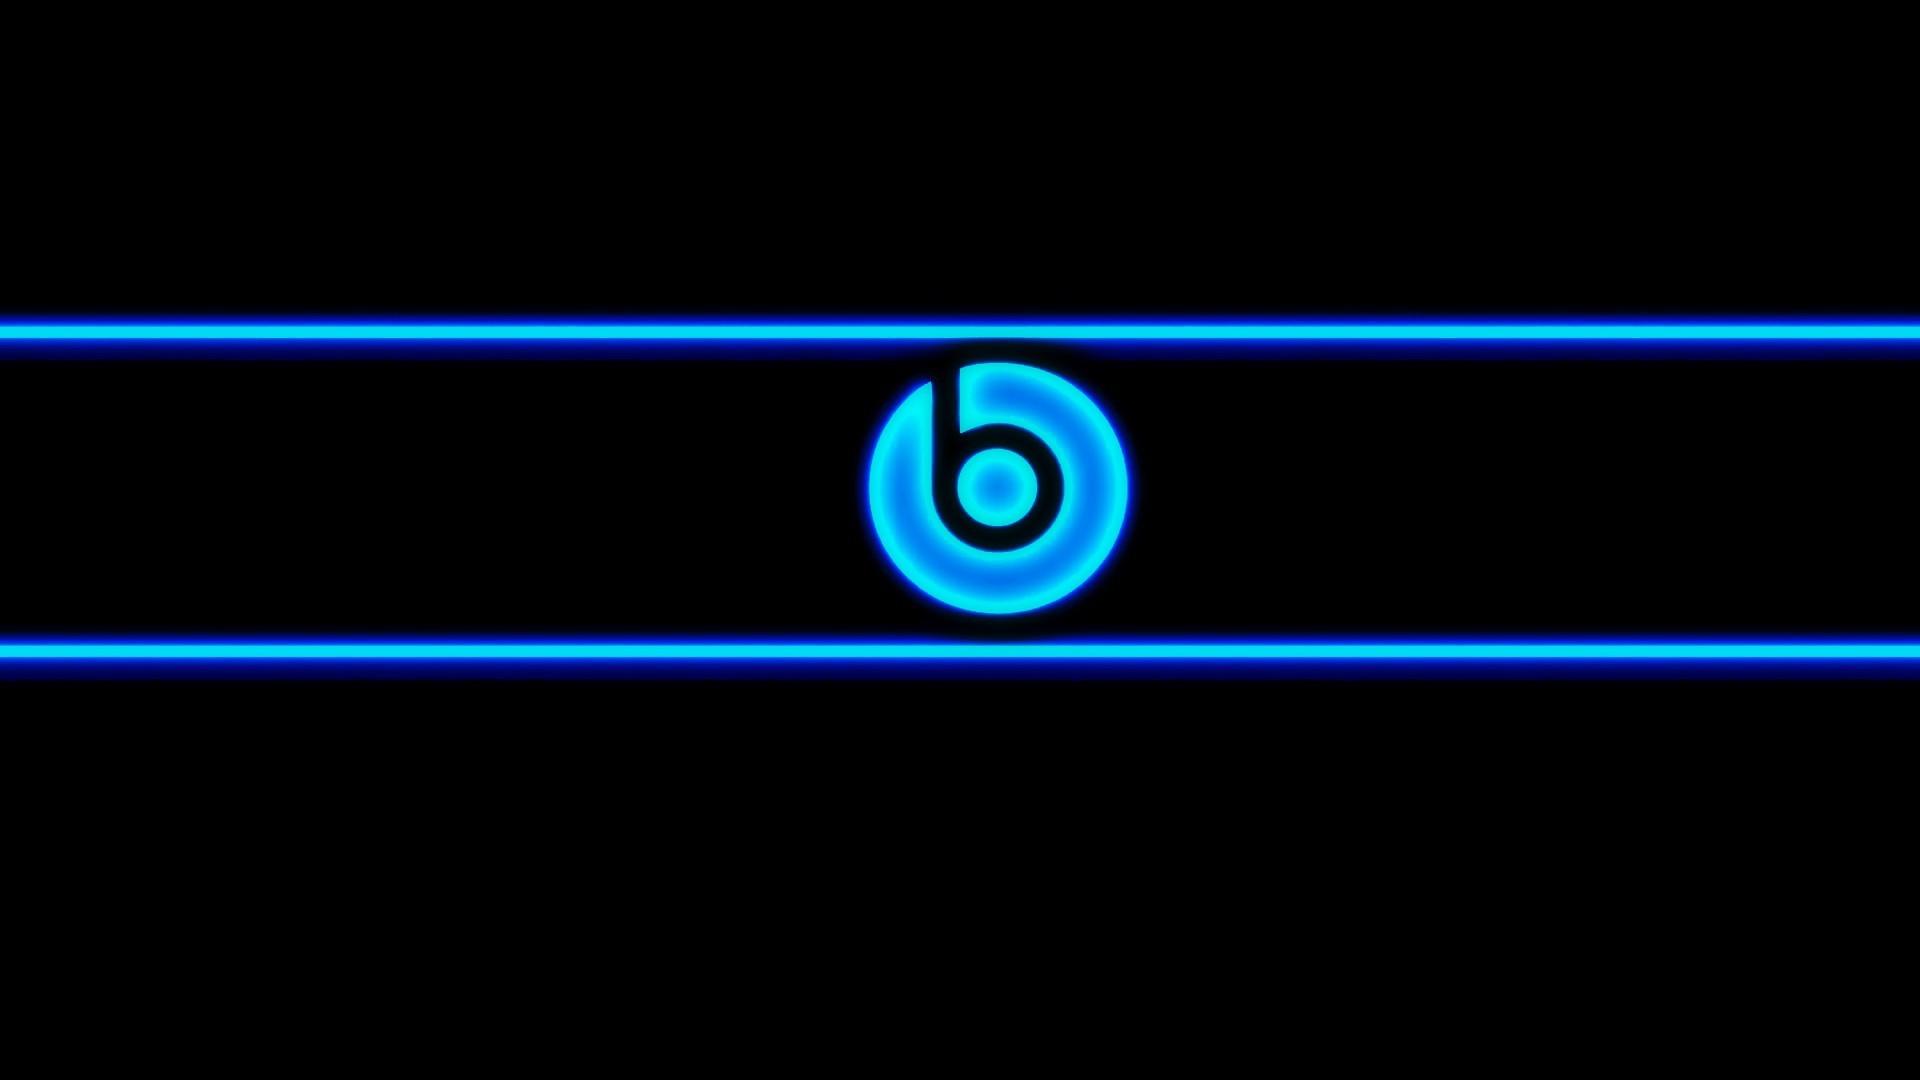 Download wallpaper Beats blue audio neon section hi tech in